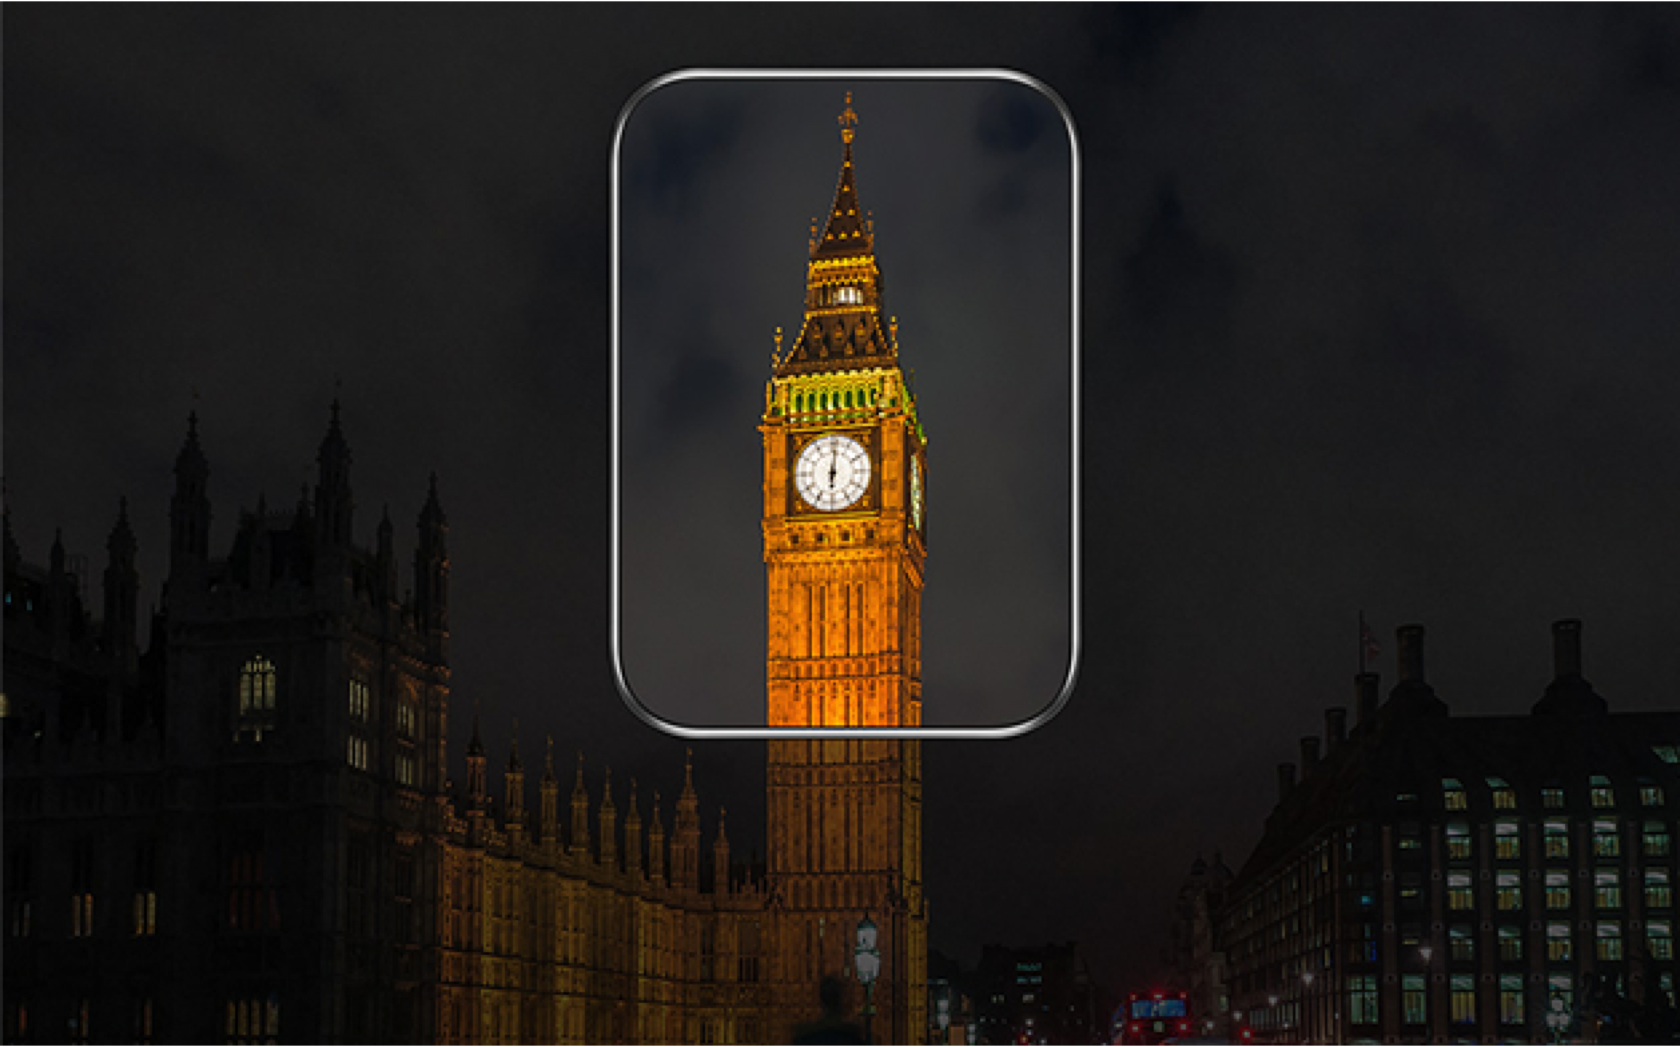 Samsung screen displaying Night view of Big Ben clock tower.